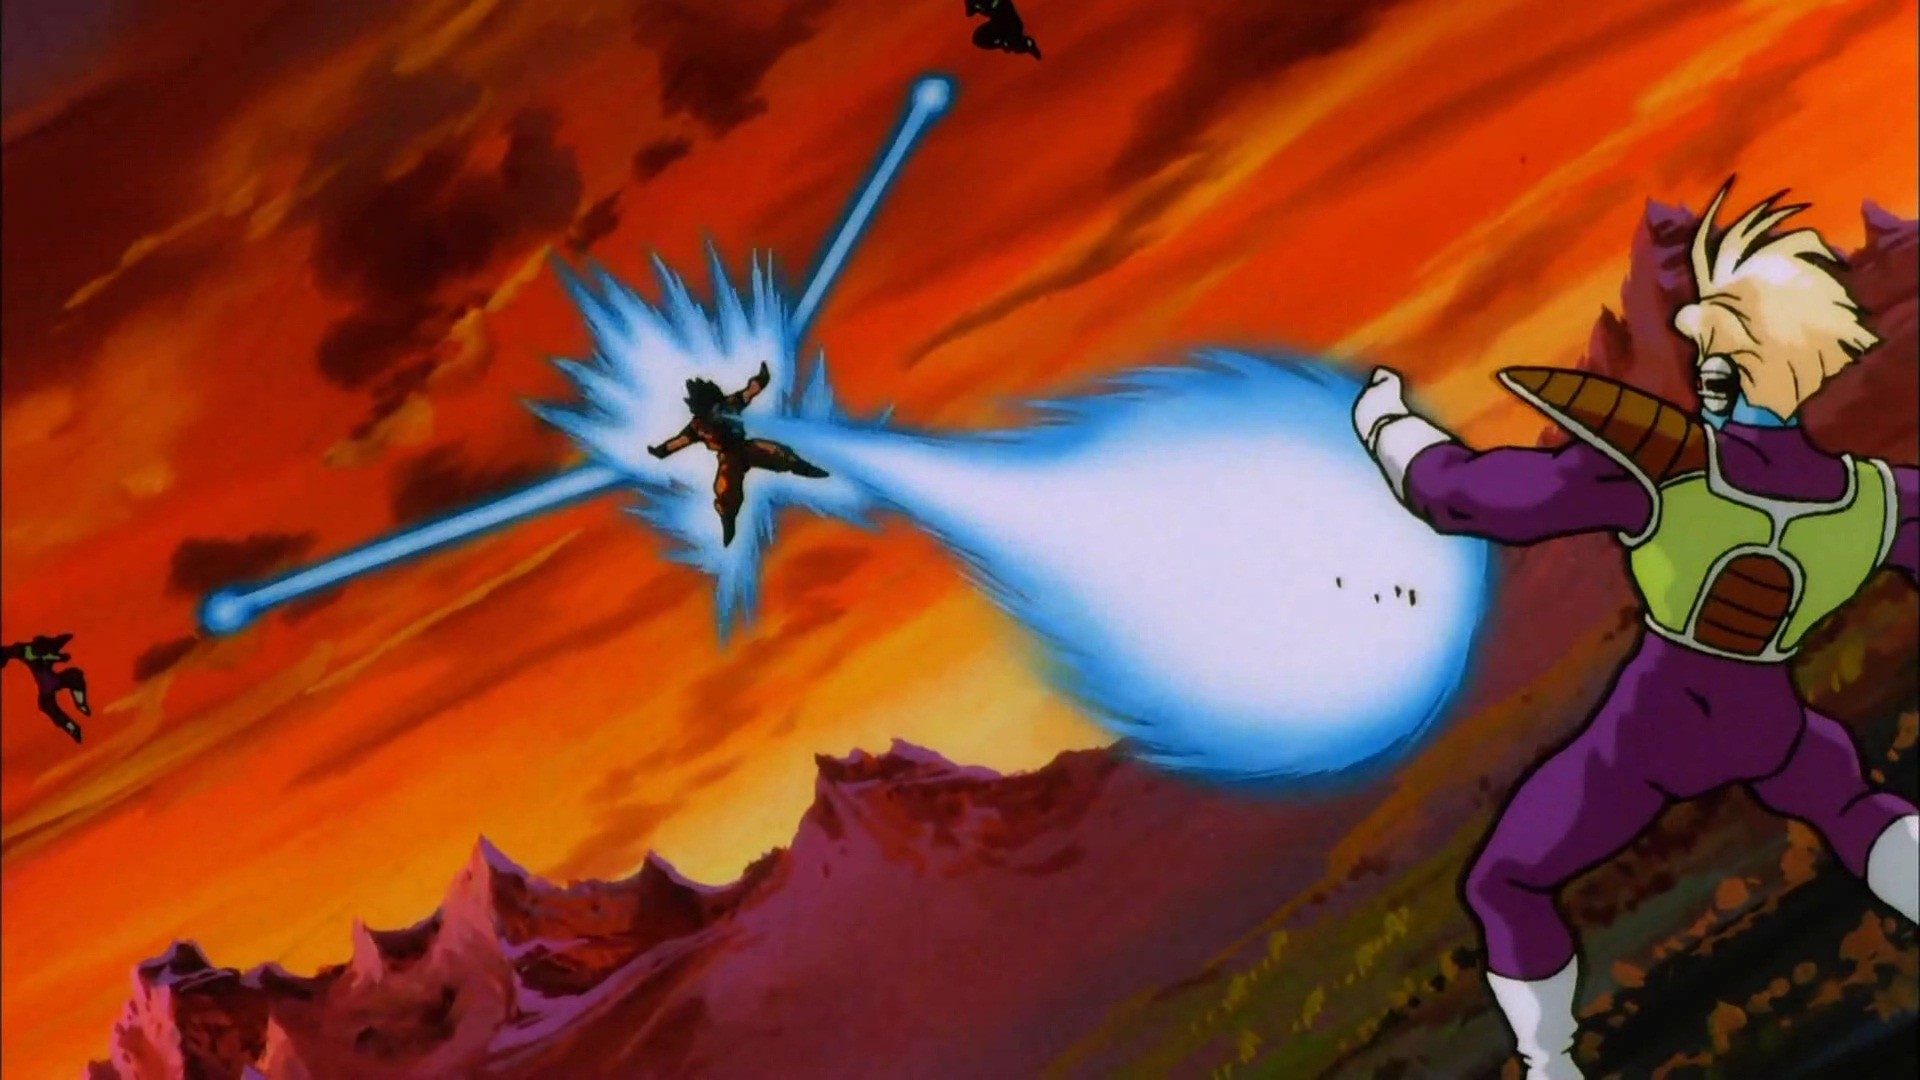 Dragon Ball Super Live Wallpaper Iphone X Super Saiyan 4 Goku And Vegeta Wallpapers 60 Images